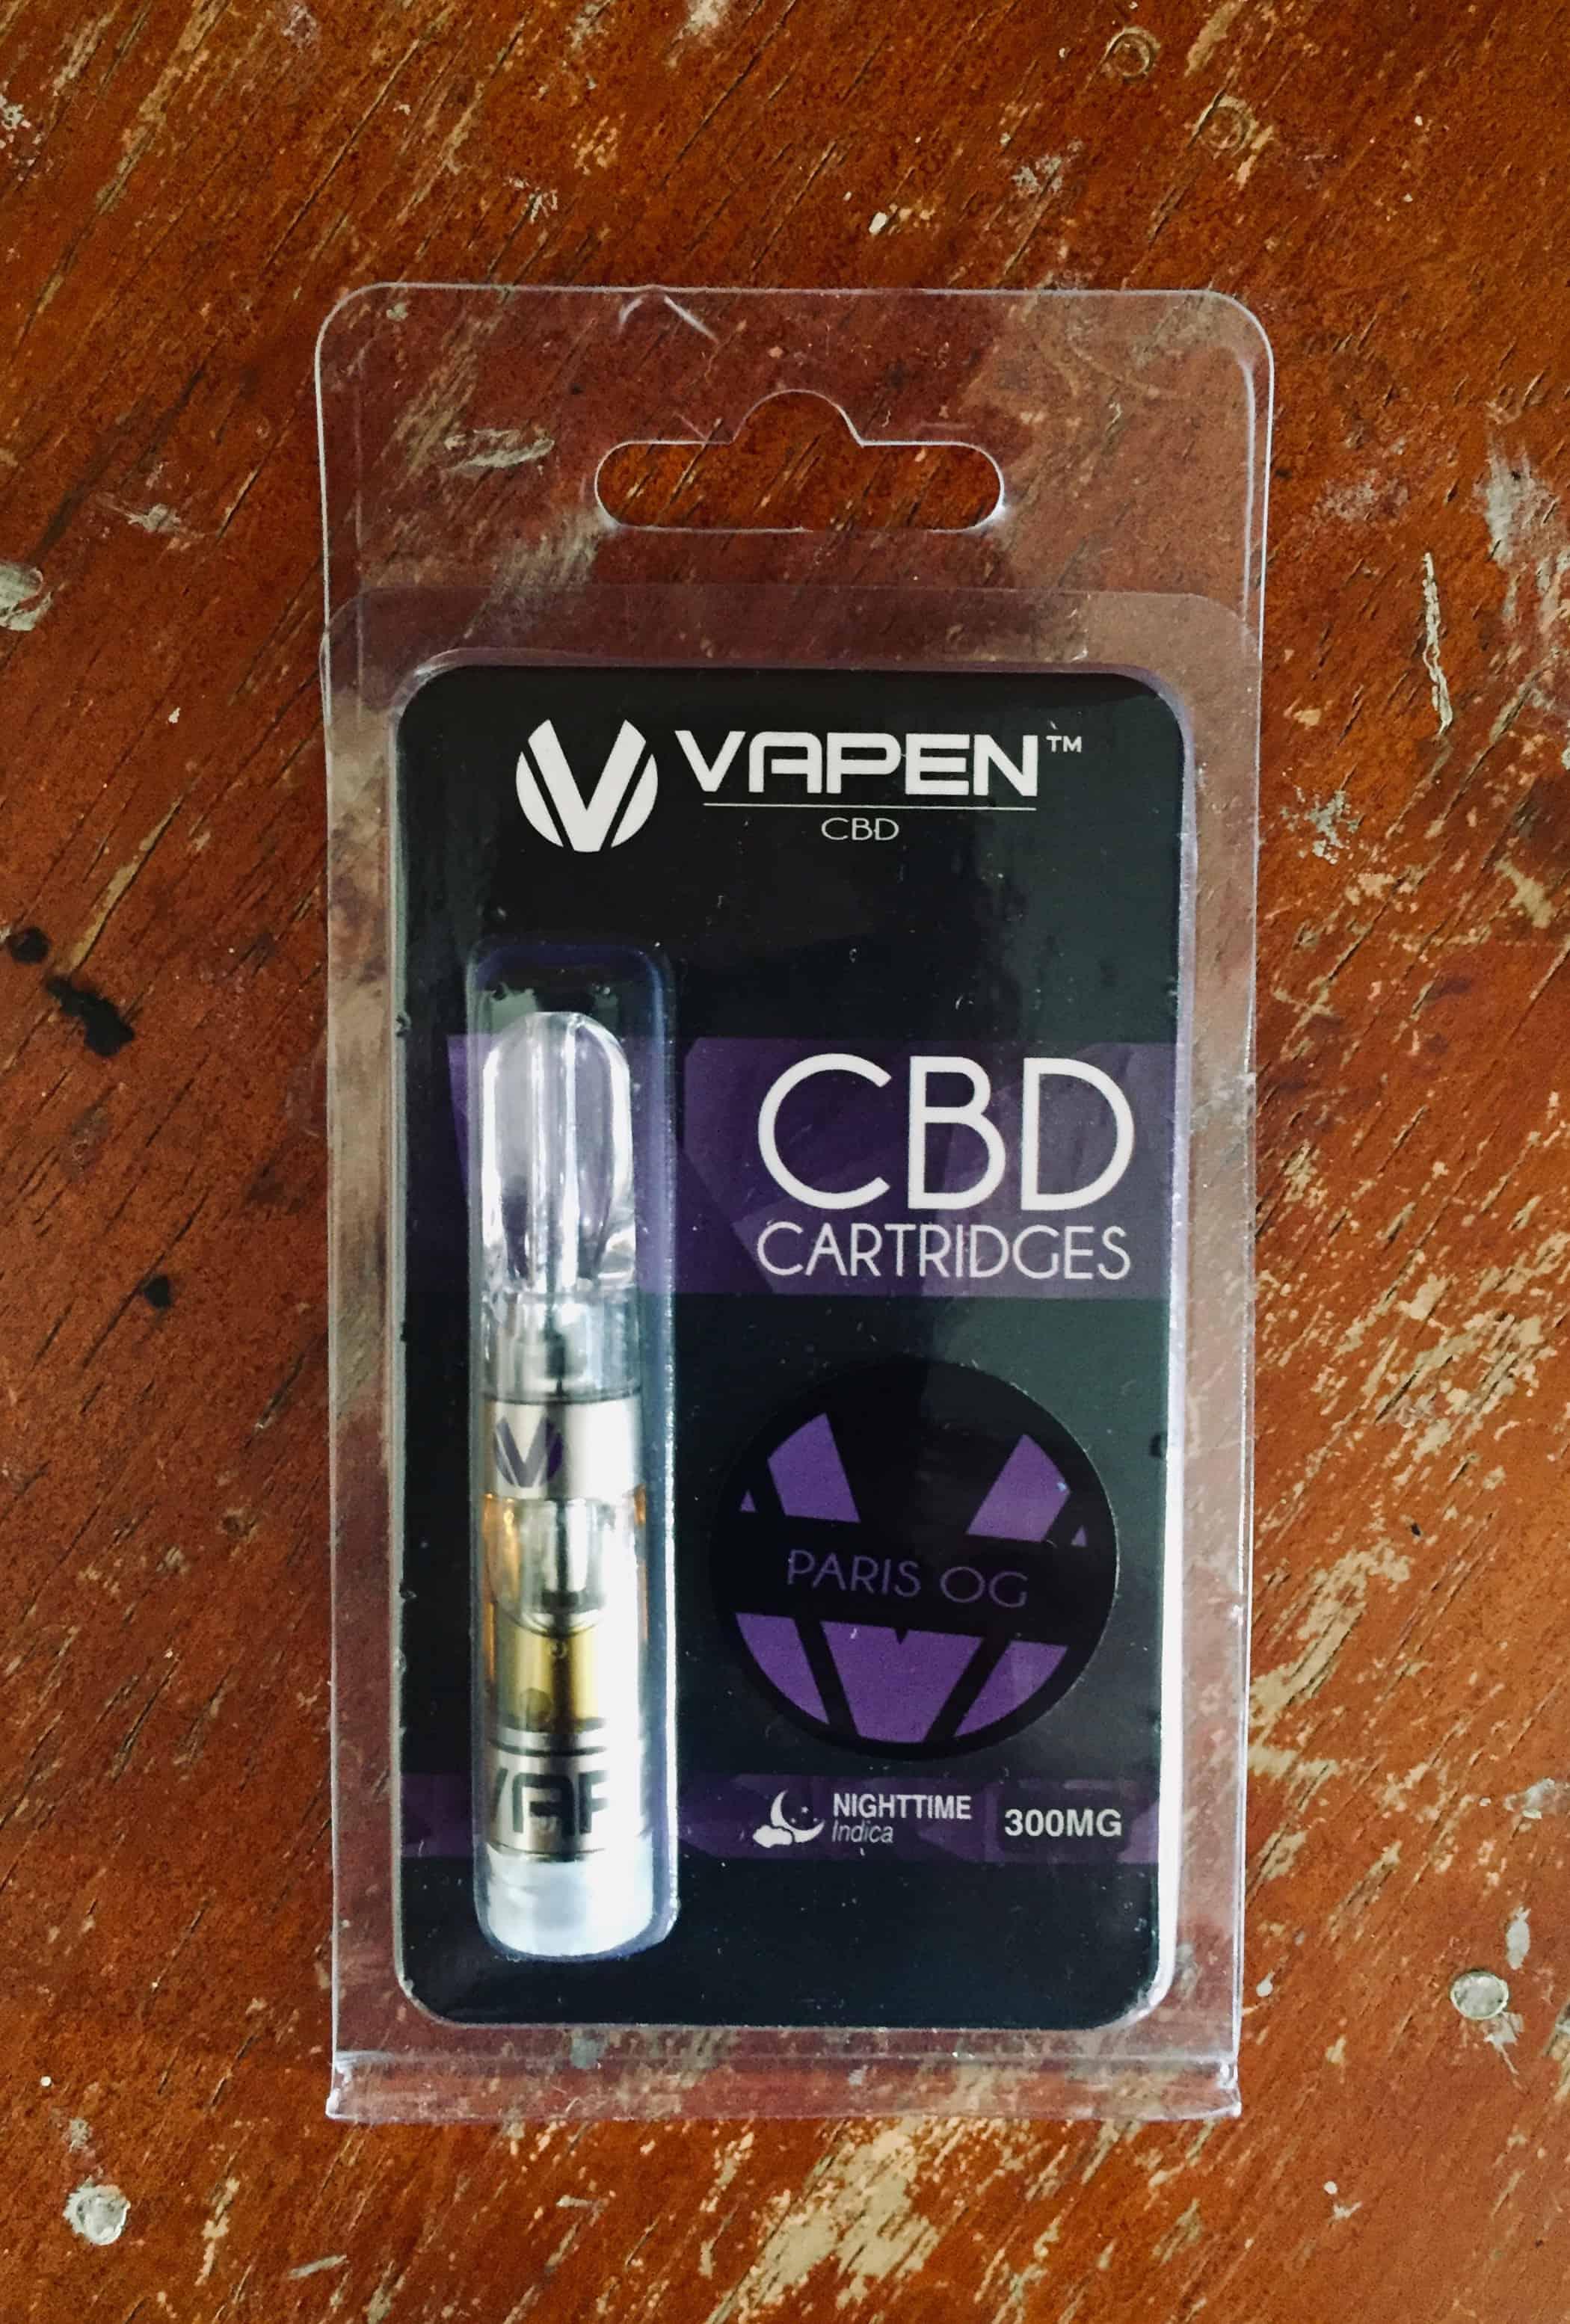 Vapen CBD Review - Paris OG - Save On Cannabis